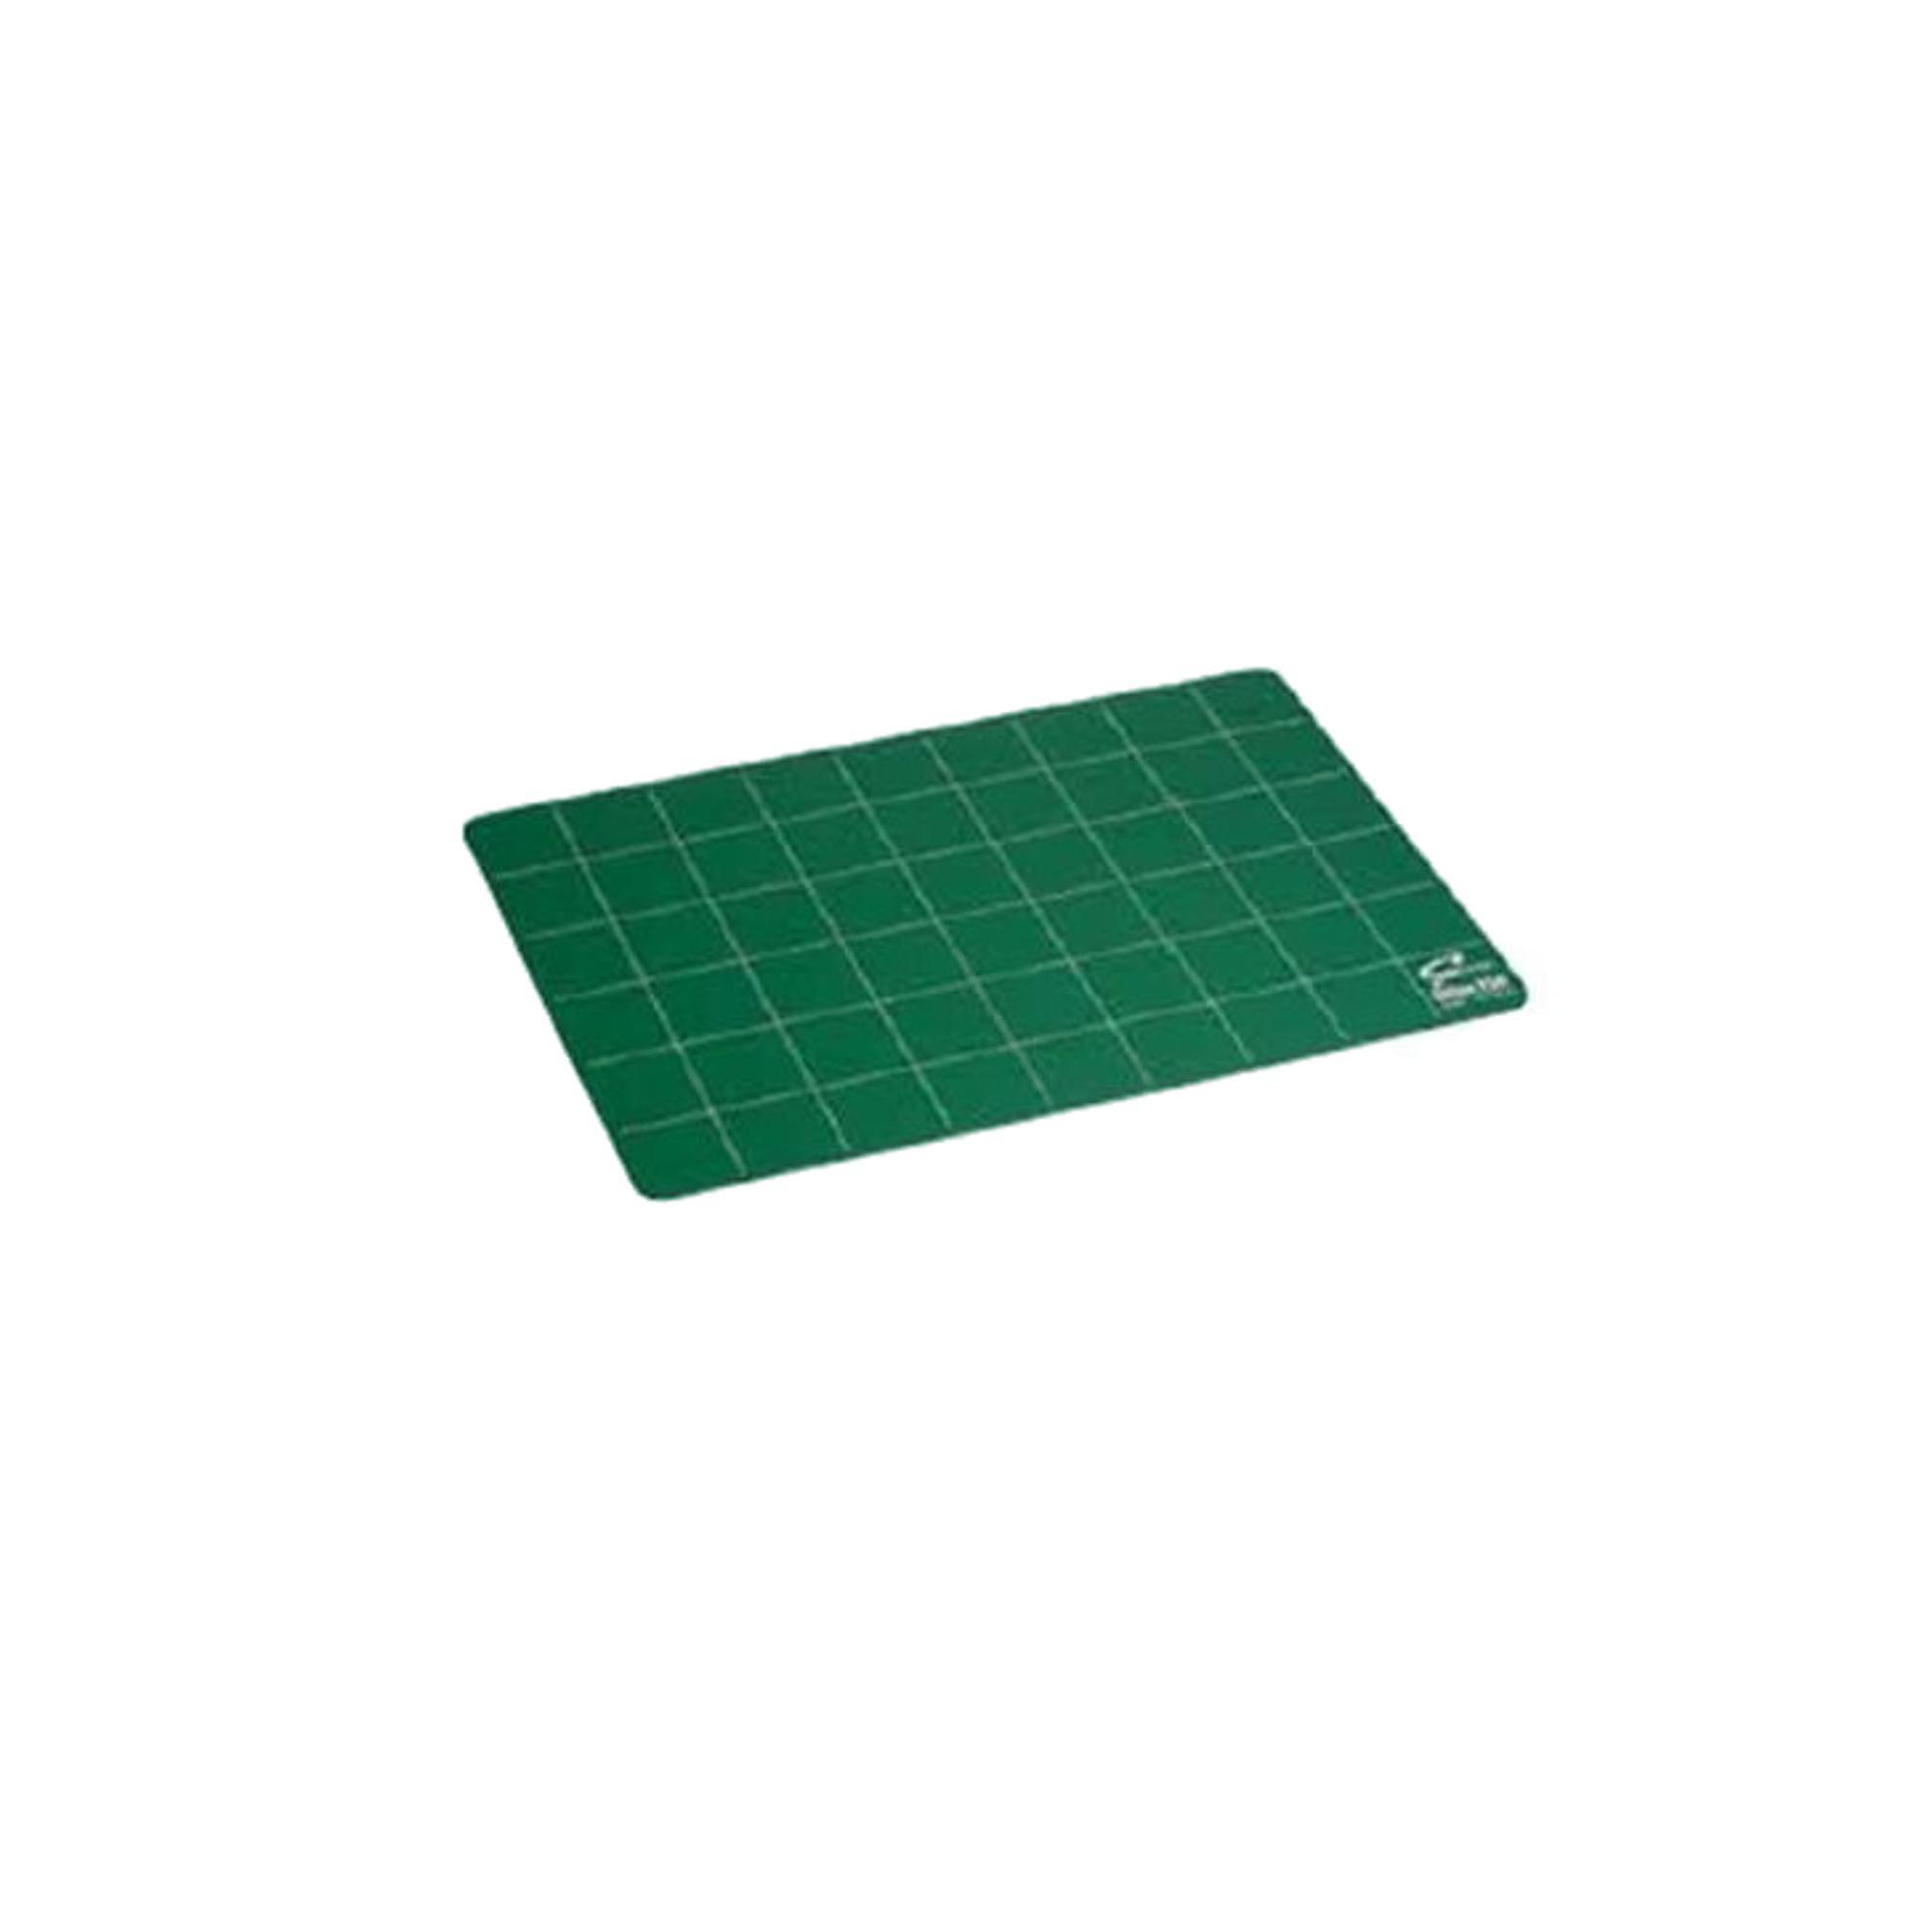 Plaque PVC 450 x 300 mm verte quadrillée